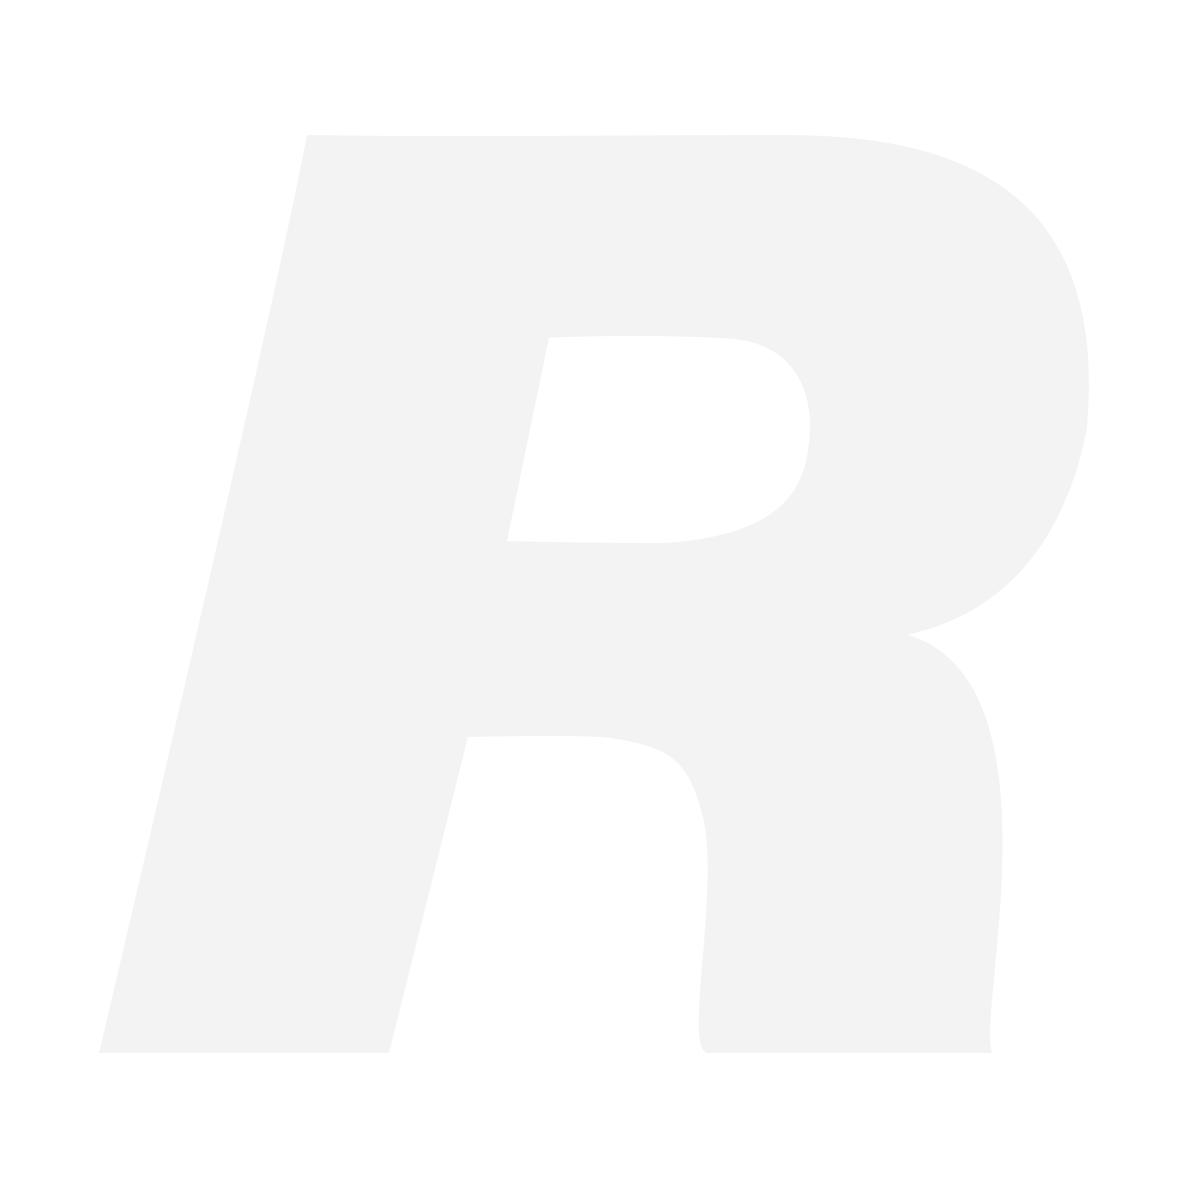 Swarovski AR-S AD Ring ATS/STS,ATM/STM,STR